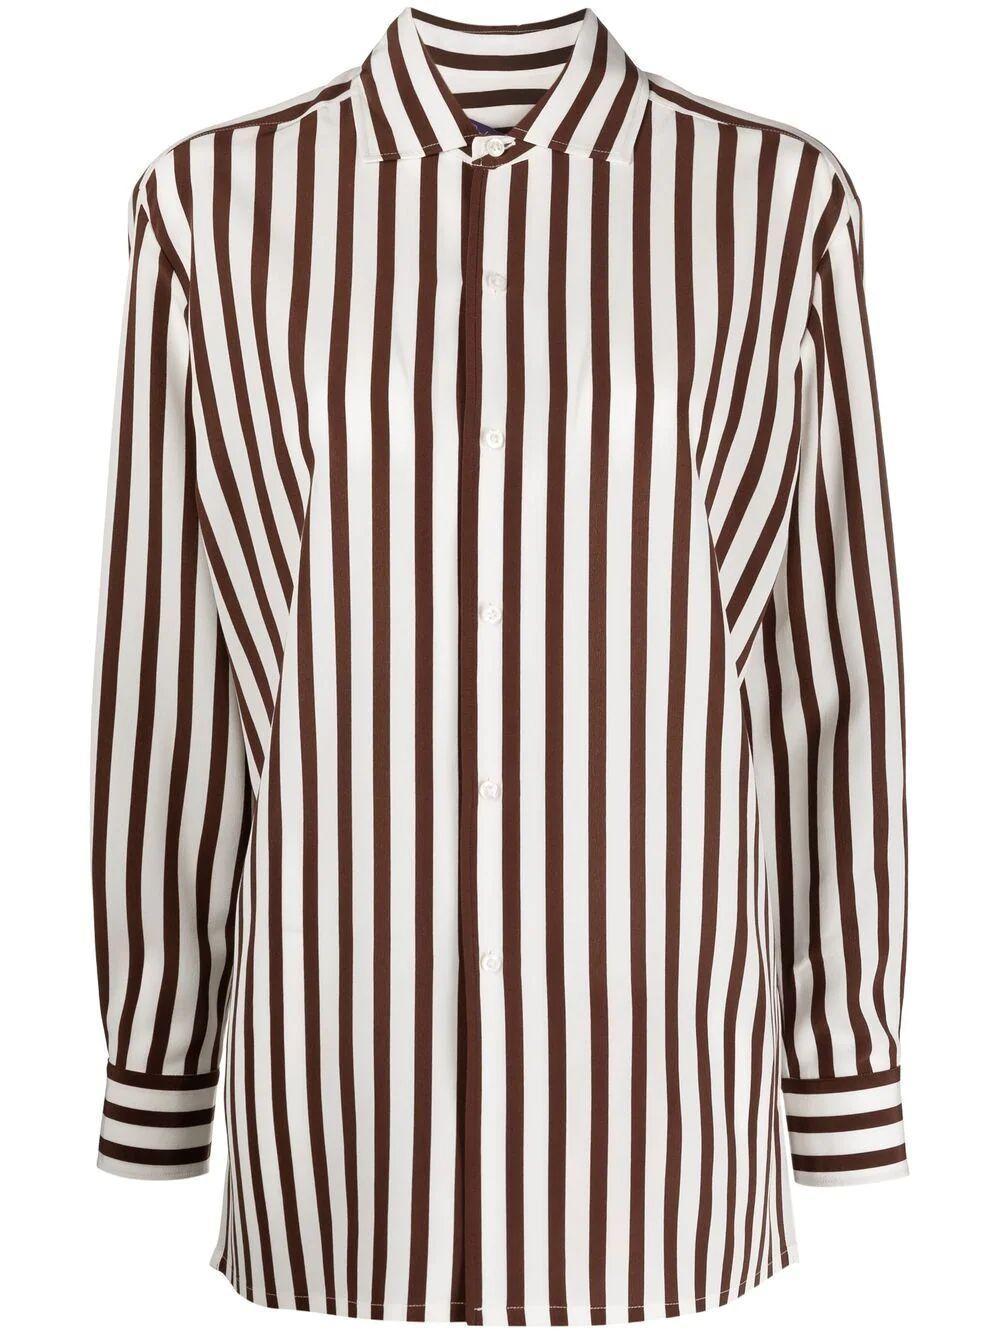 Capri Stripe Shirt Item # 290840856002